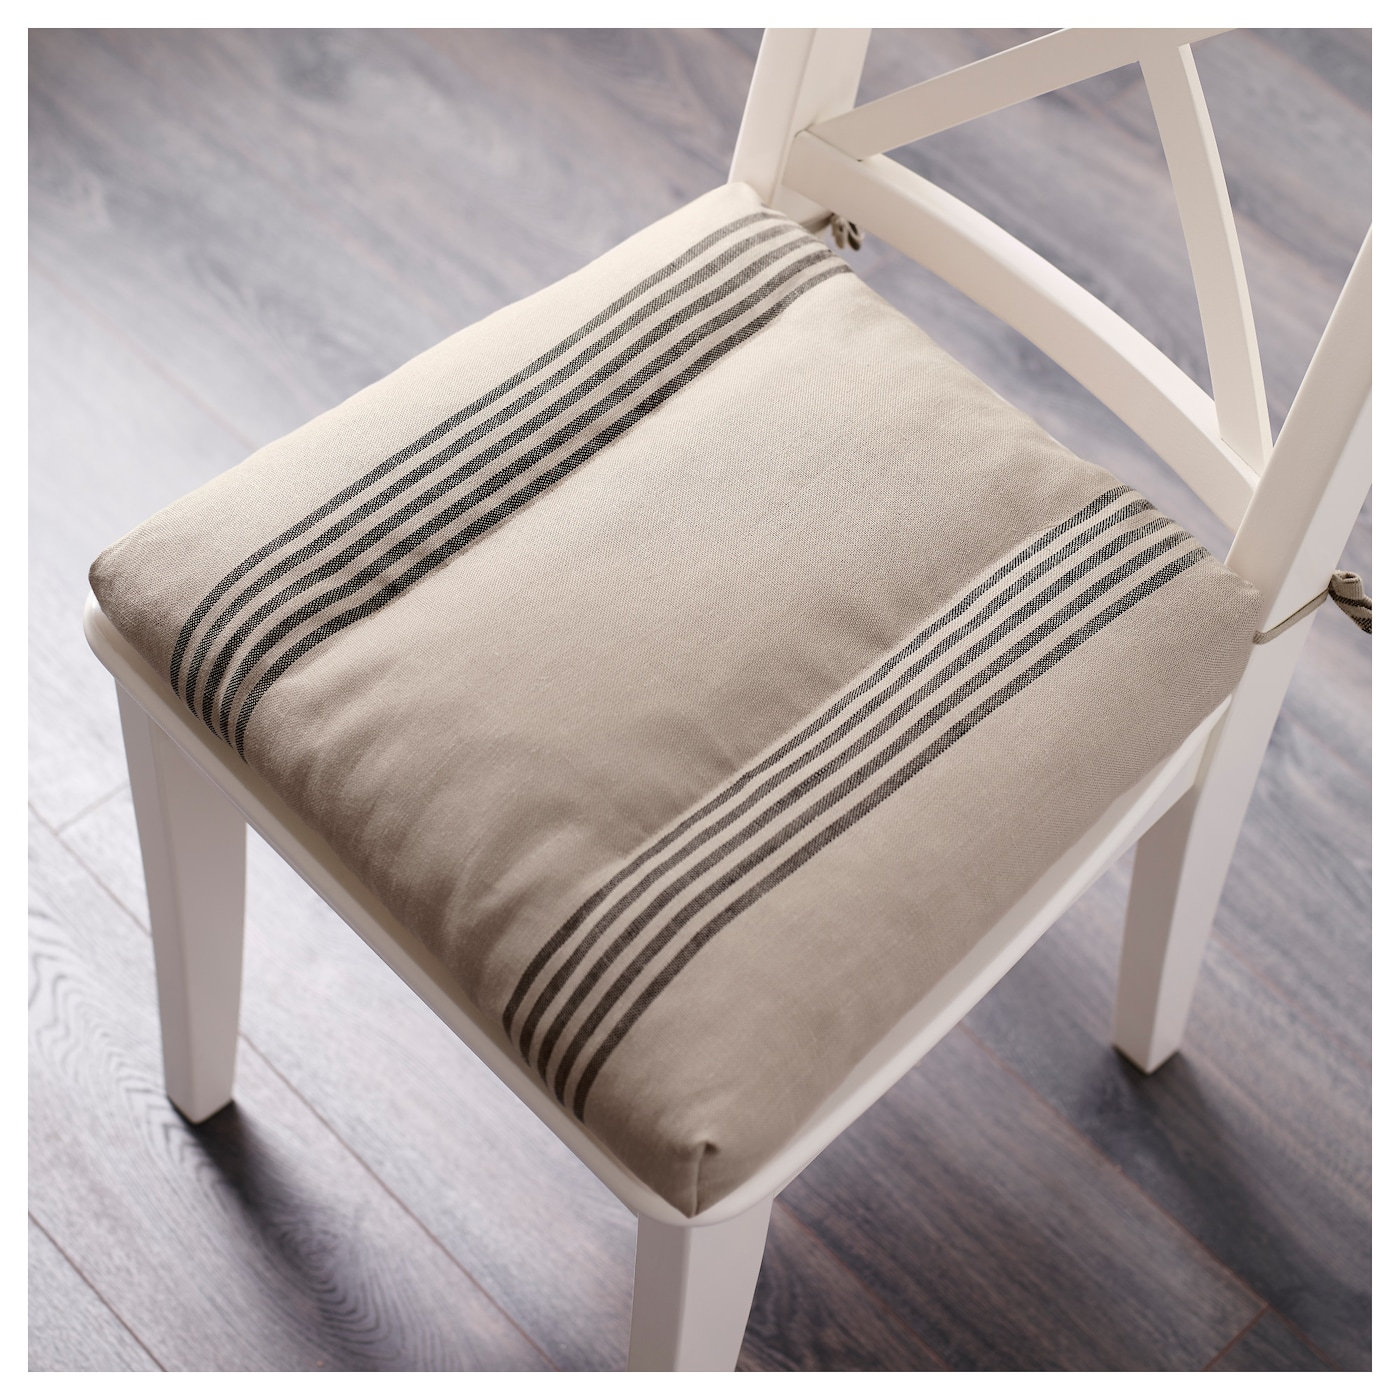 ullamaj chair cushion beige black 35 43 x 37 x 7 cm ikea. Black Bedroom Furniture Sets. Home Design Ideas